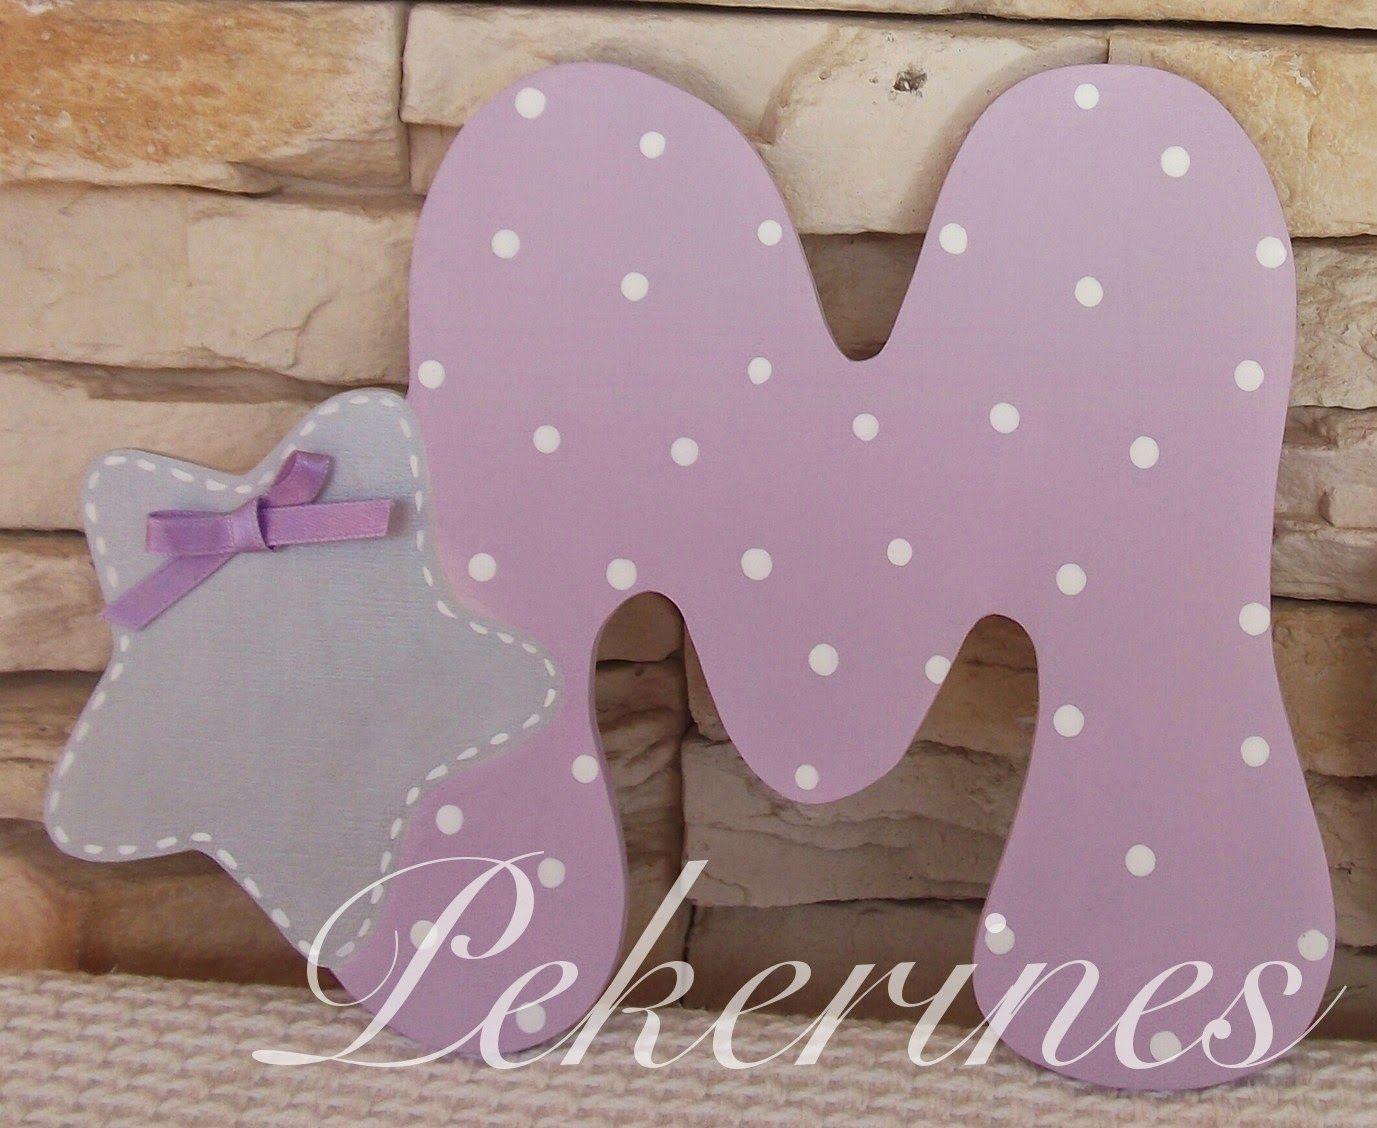 Decoraci n infantil pekerines letras iniciales de madera decoradas - Letras decoradas infantiles ...